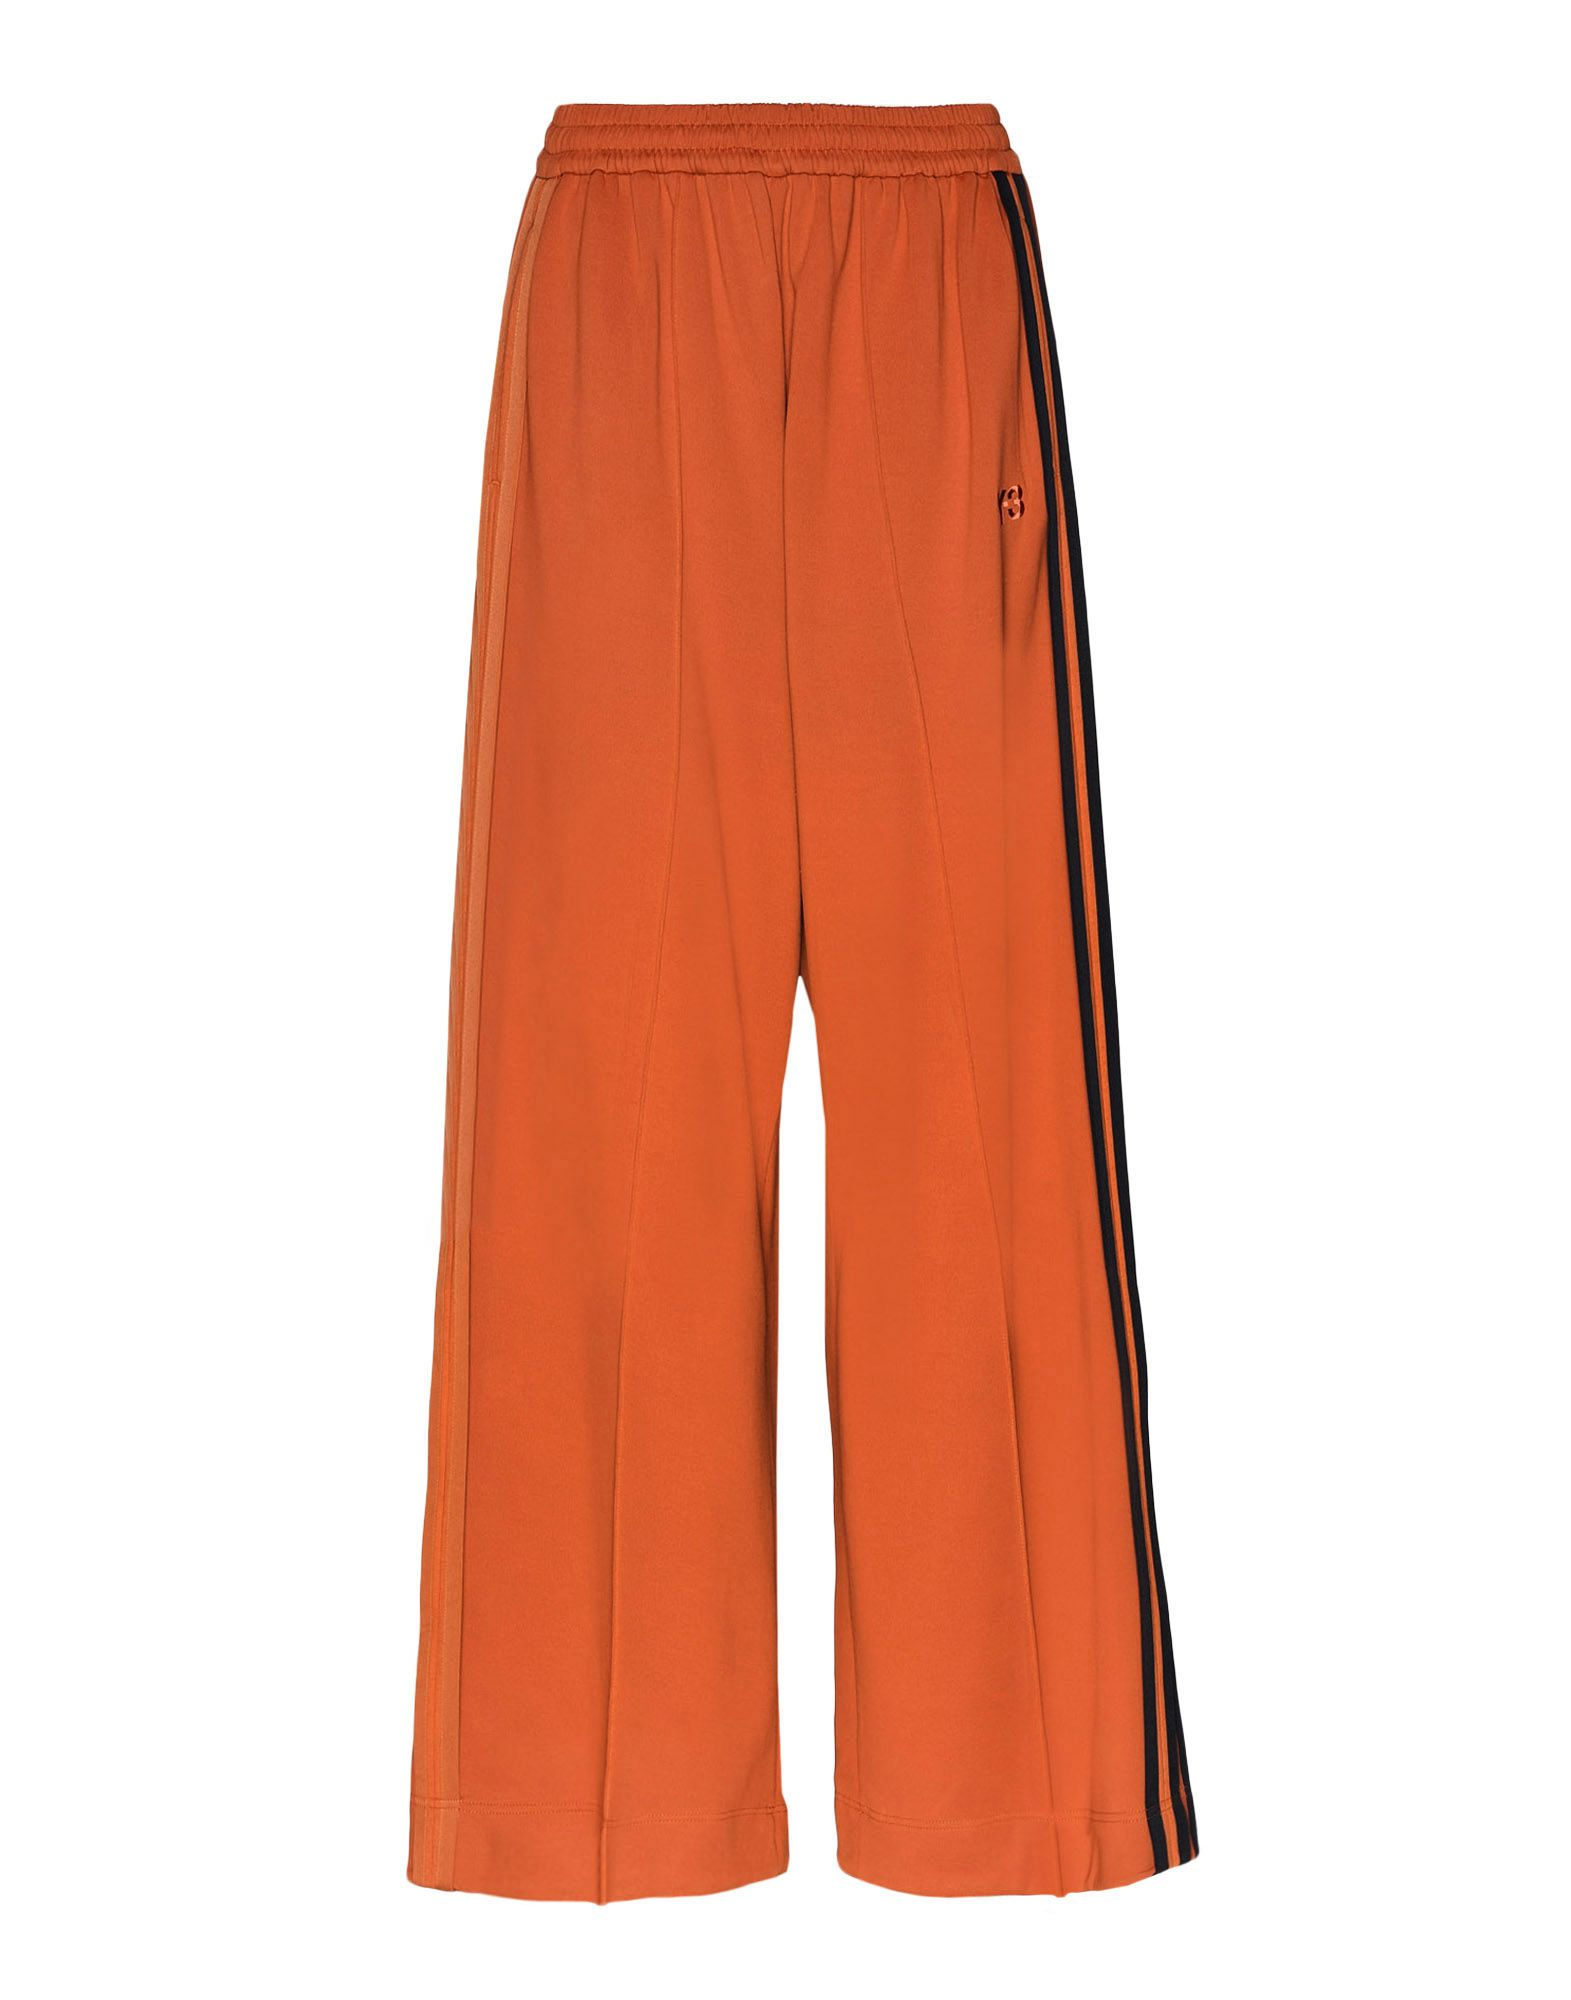 Y-3 Y-3 3-Stripes Selvedge Matte Track Pants Track pant Woman f